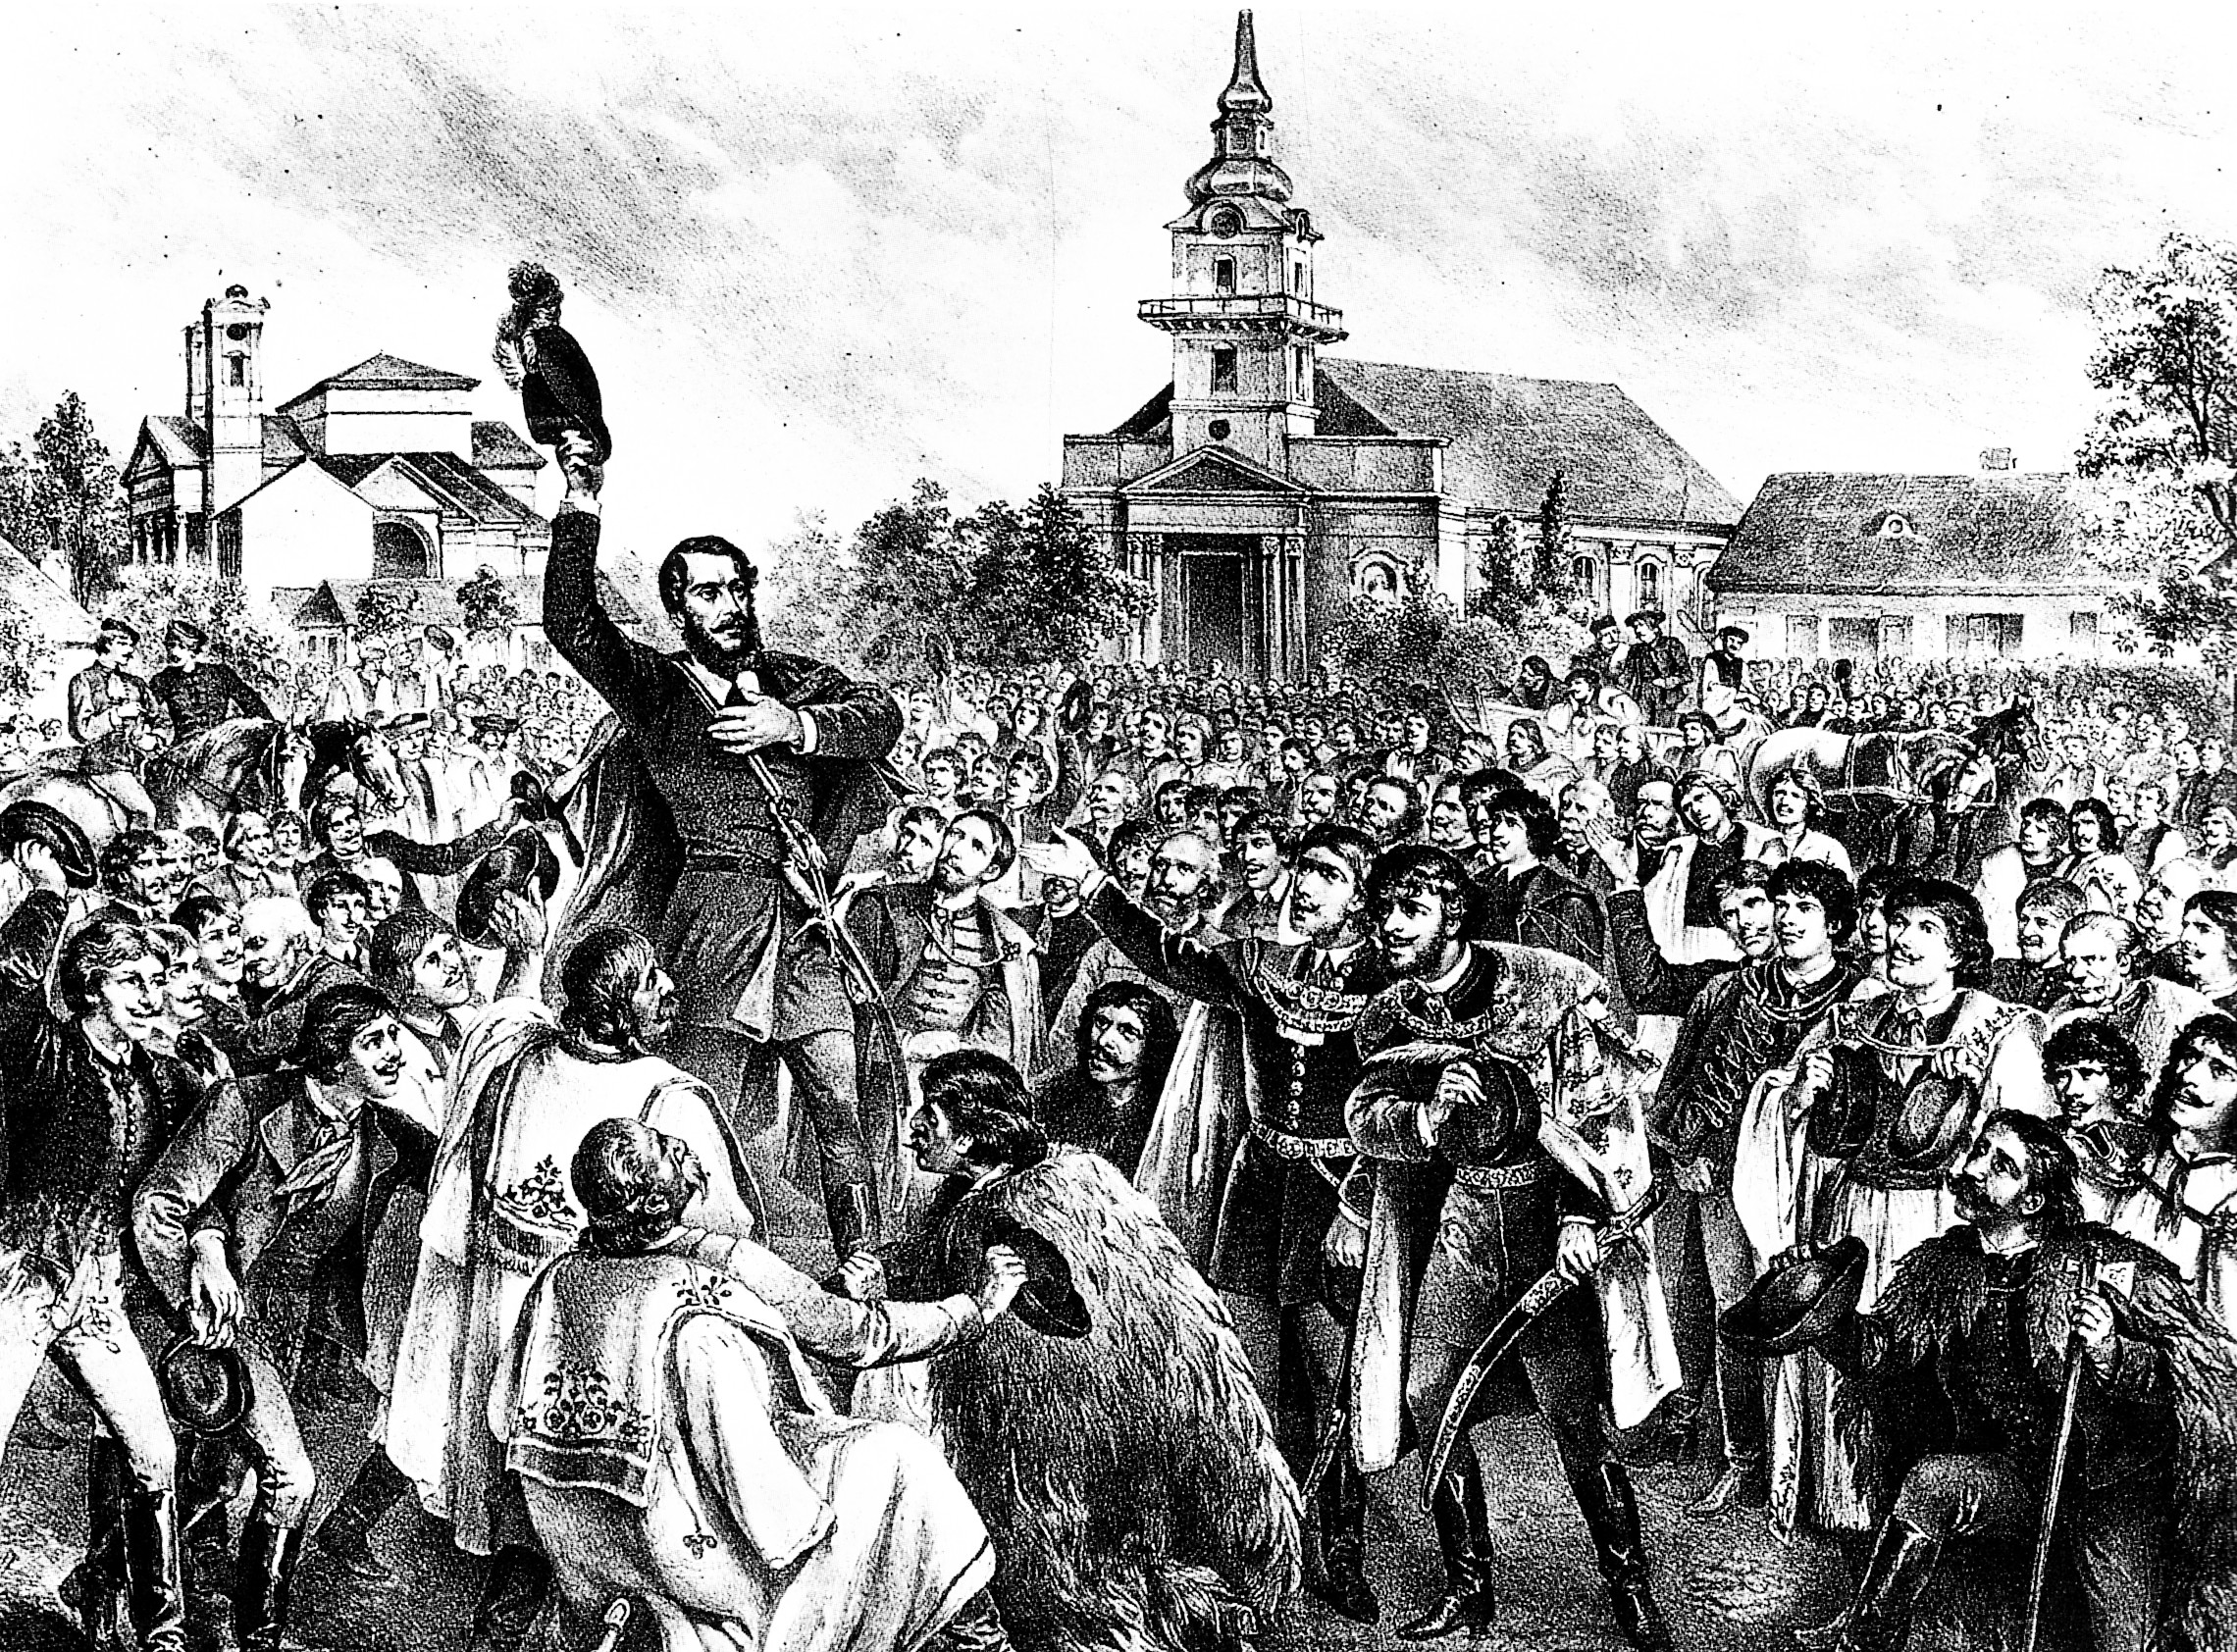 File:Kollarz Kossuth Cegléden 1848.JPG